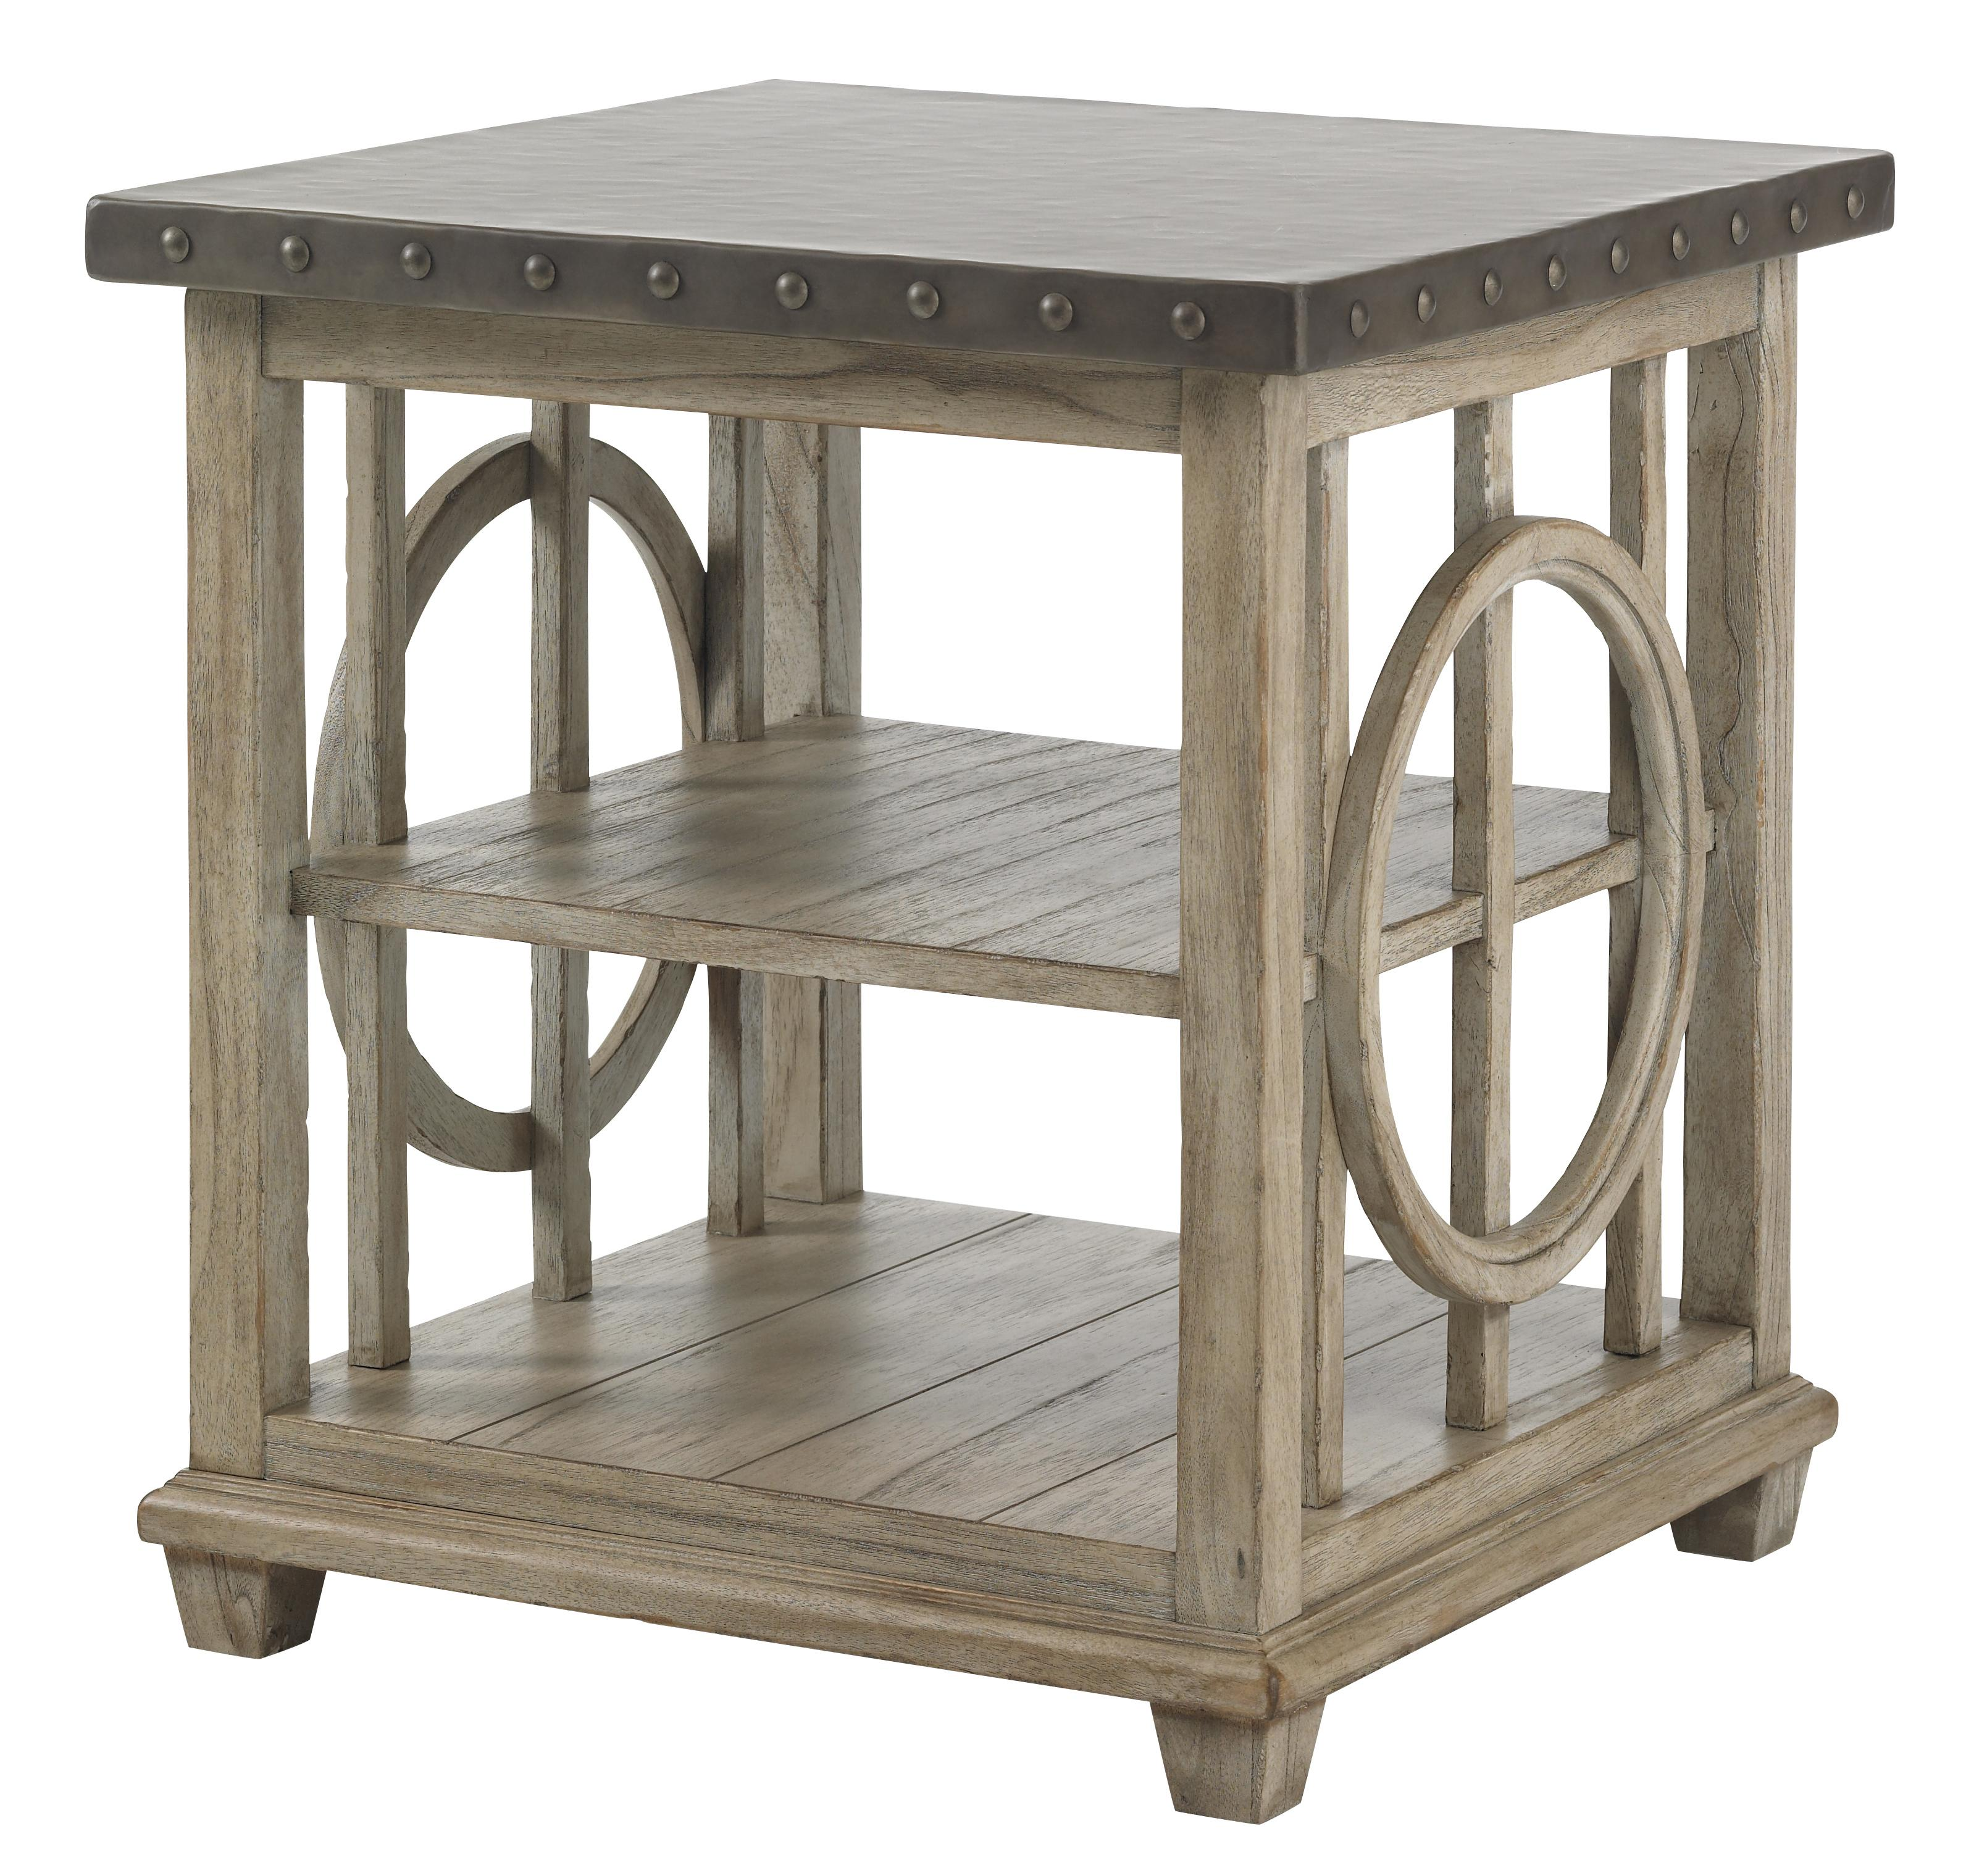 Twilight Bay Wyatt Lamp Table by Lexington at Baer's Furniture